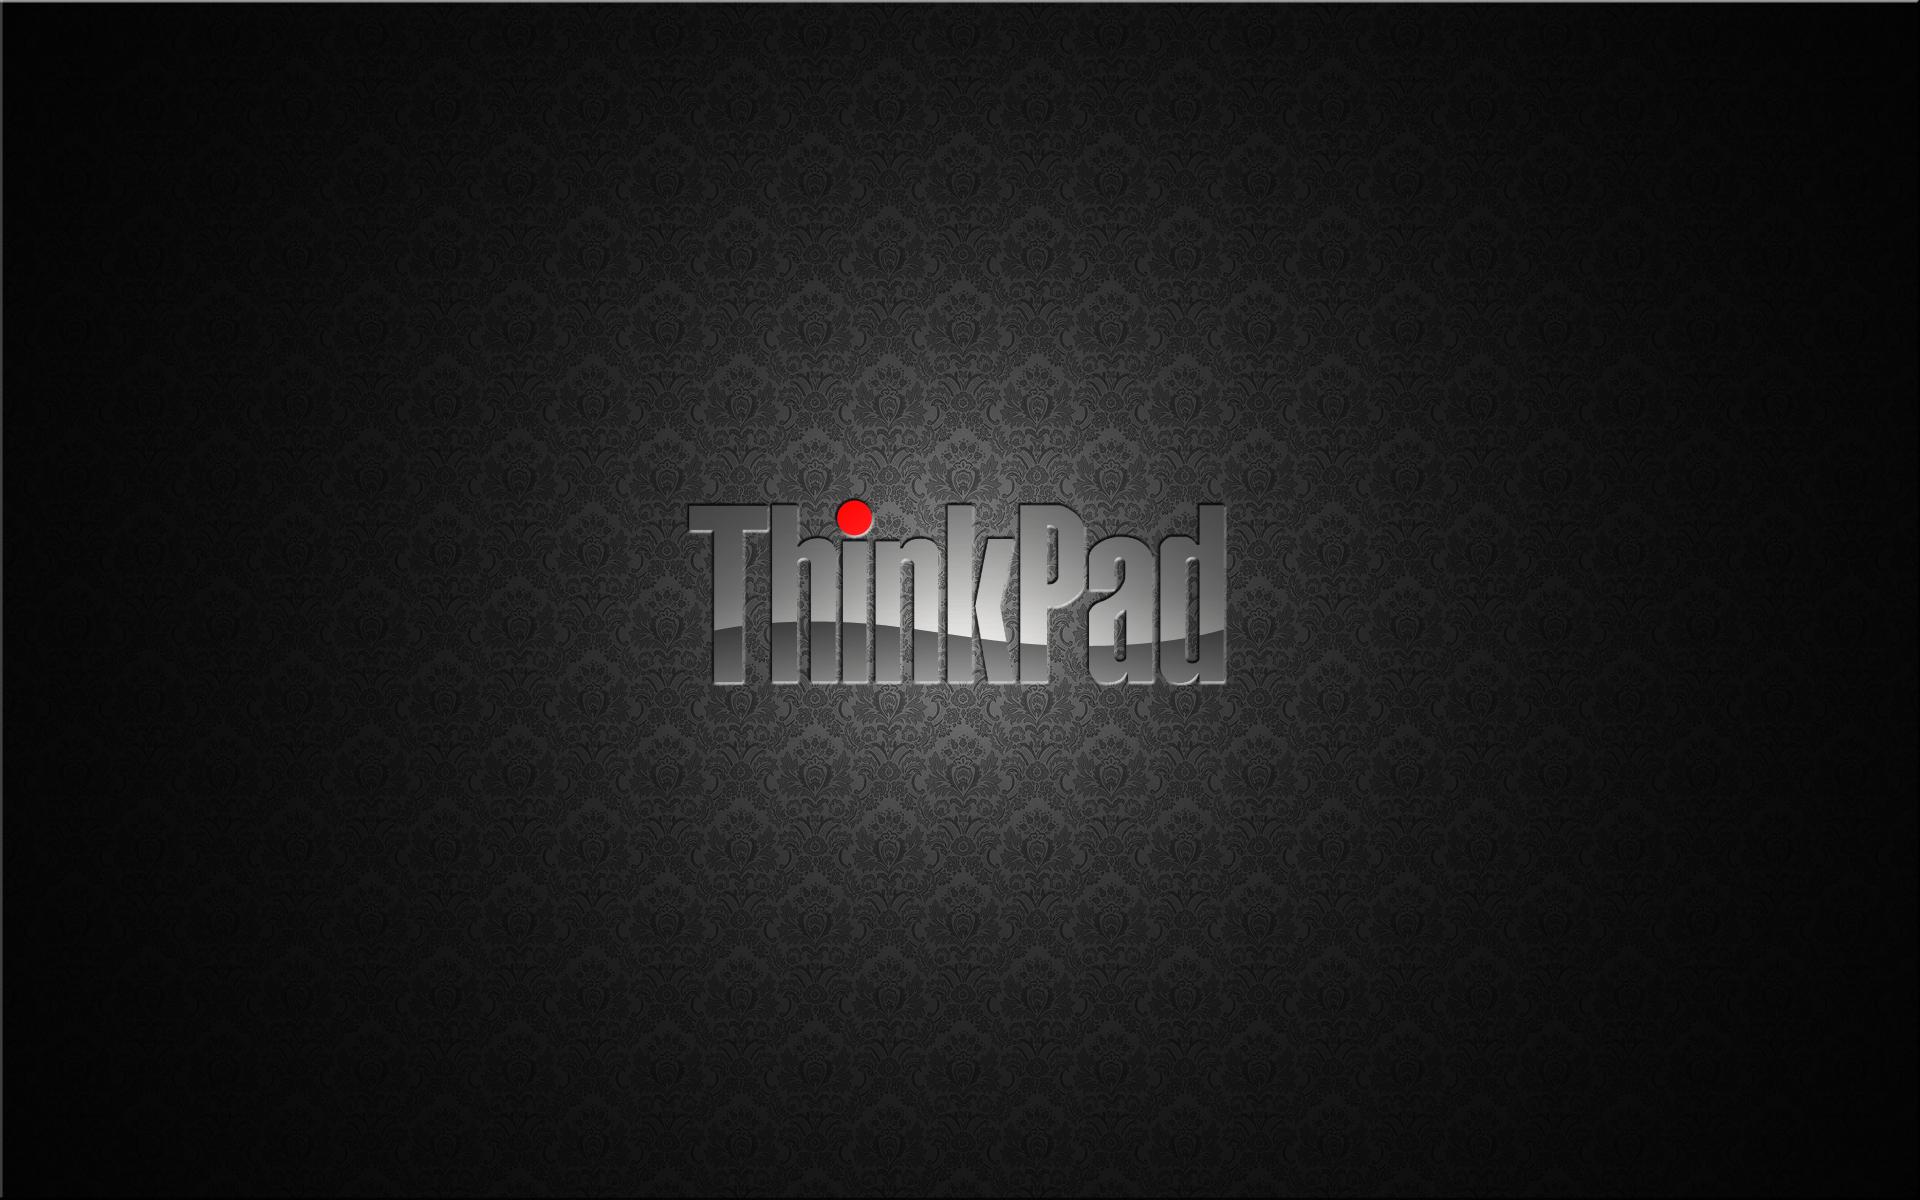 frasier labarbera ThinkPad Wallpaper Desktop 1920x1200